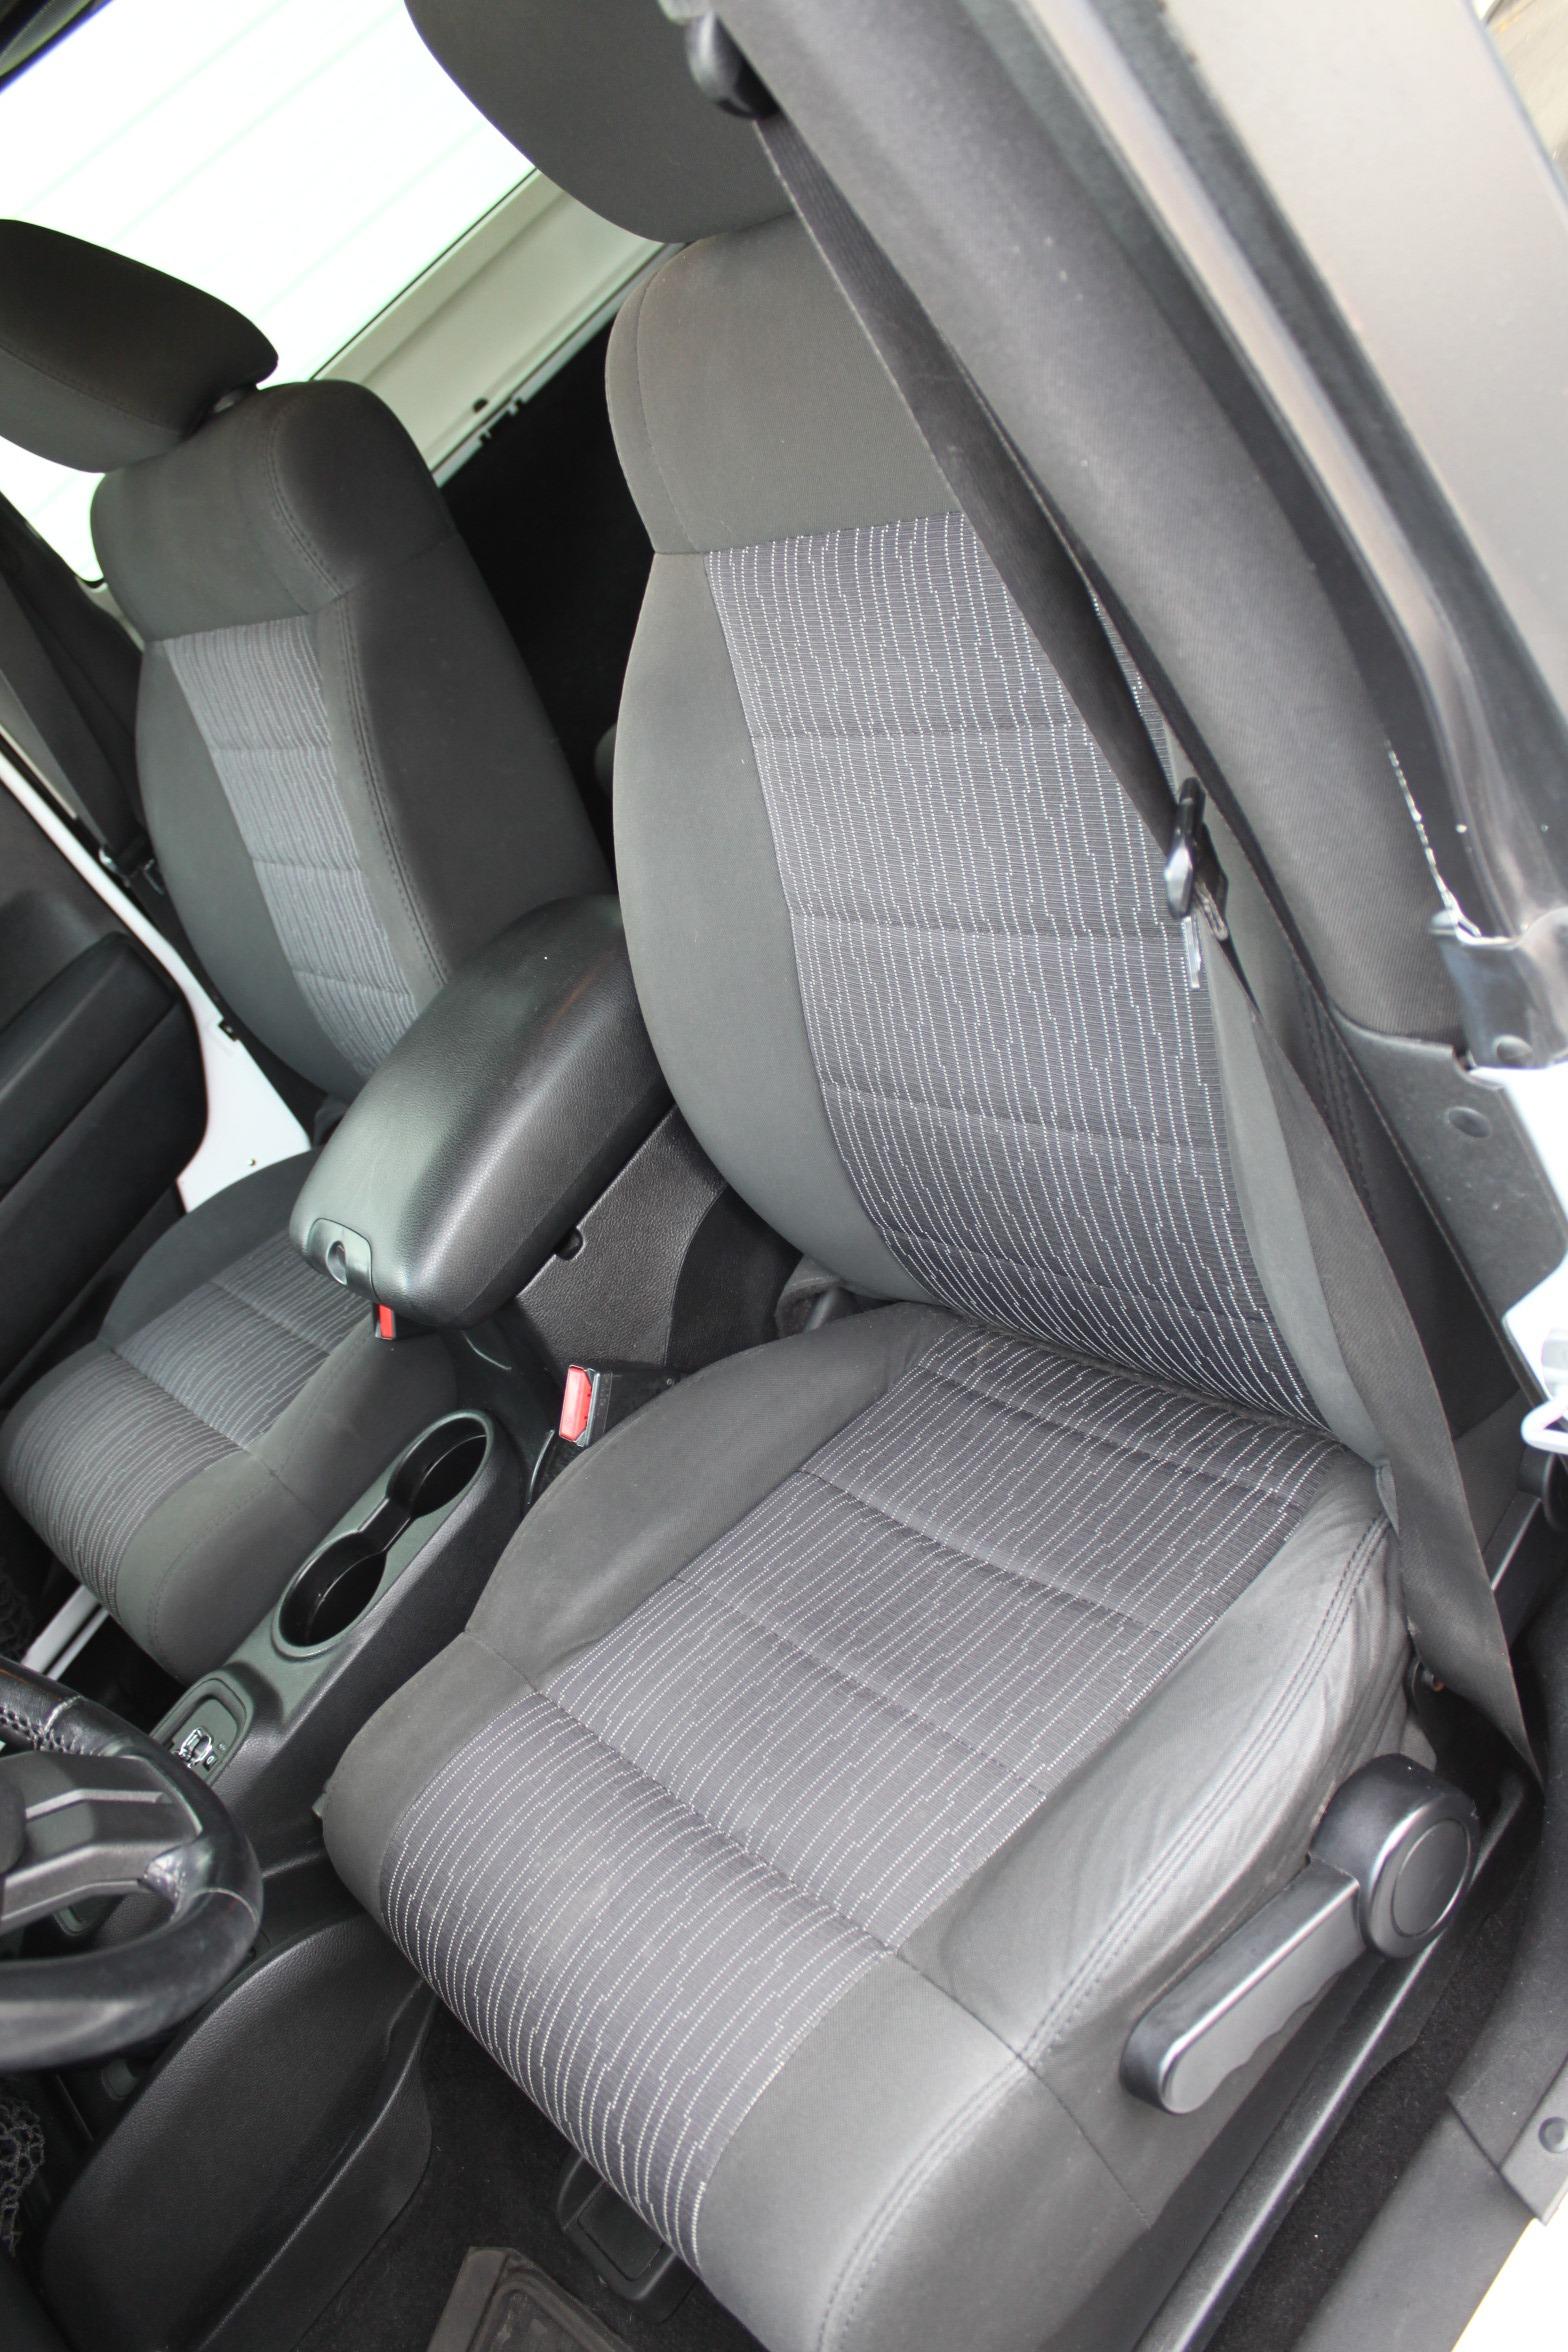 Used-2012-Jeep-Wrangler-Freedom-Edition-4X4-Honda